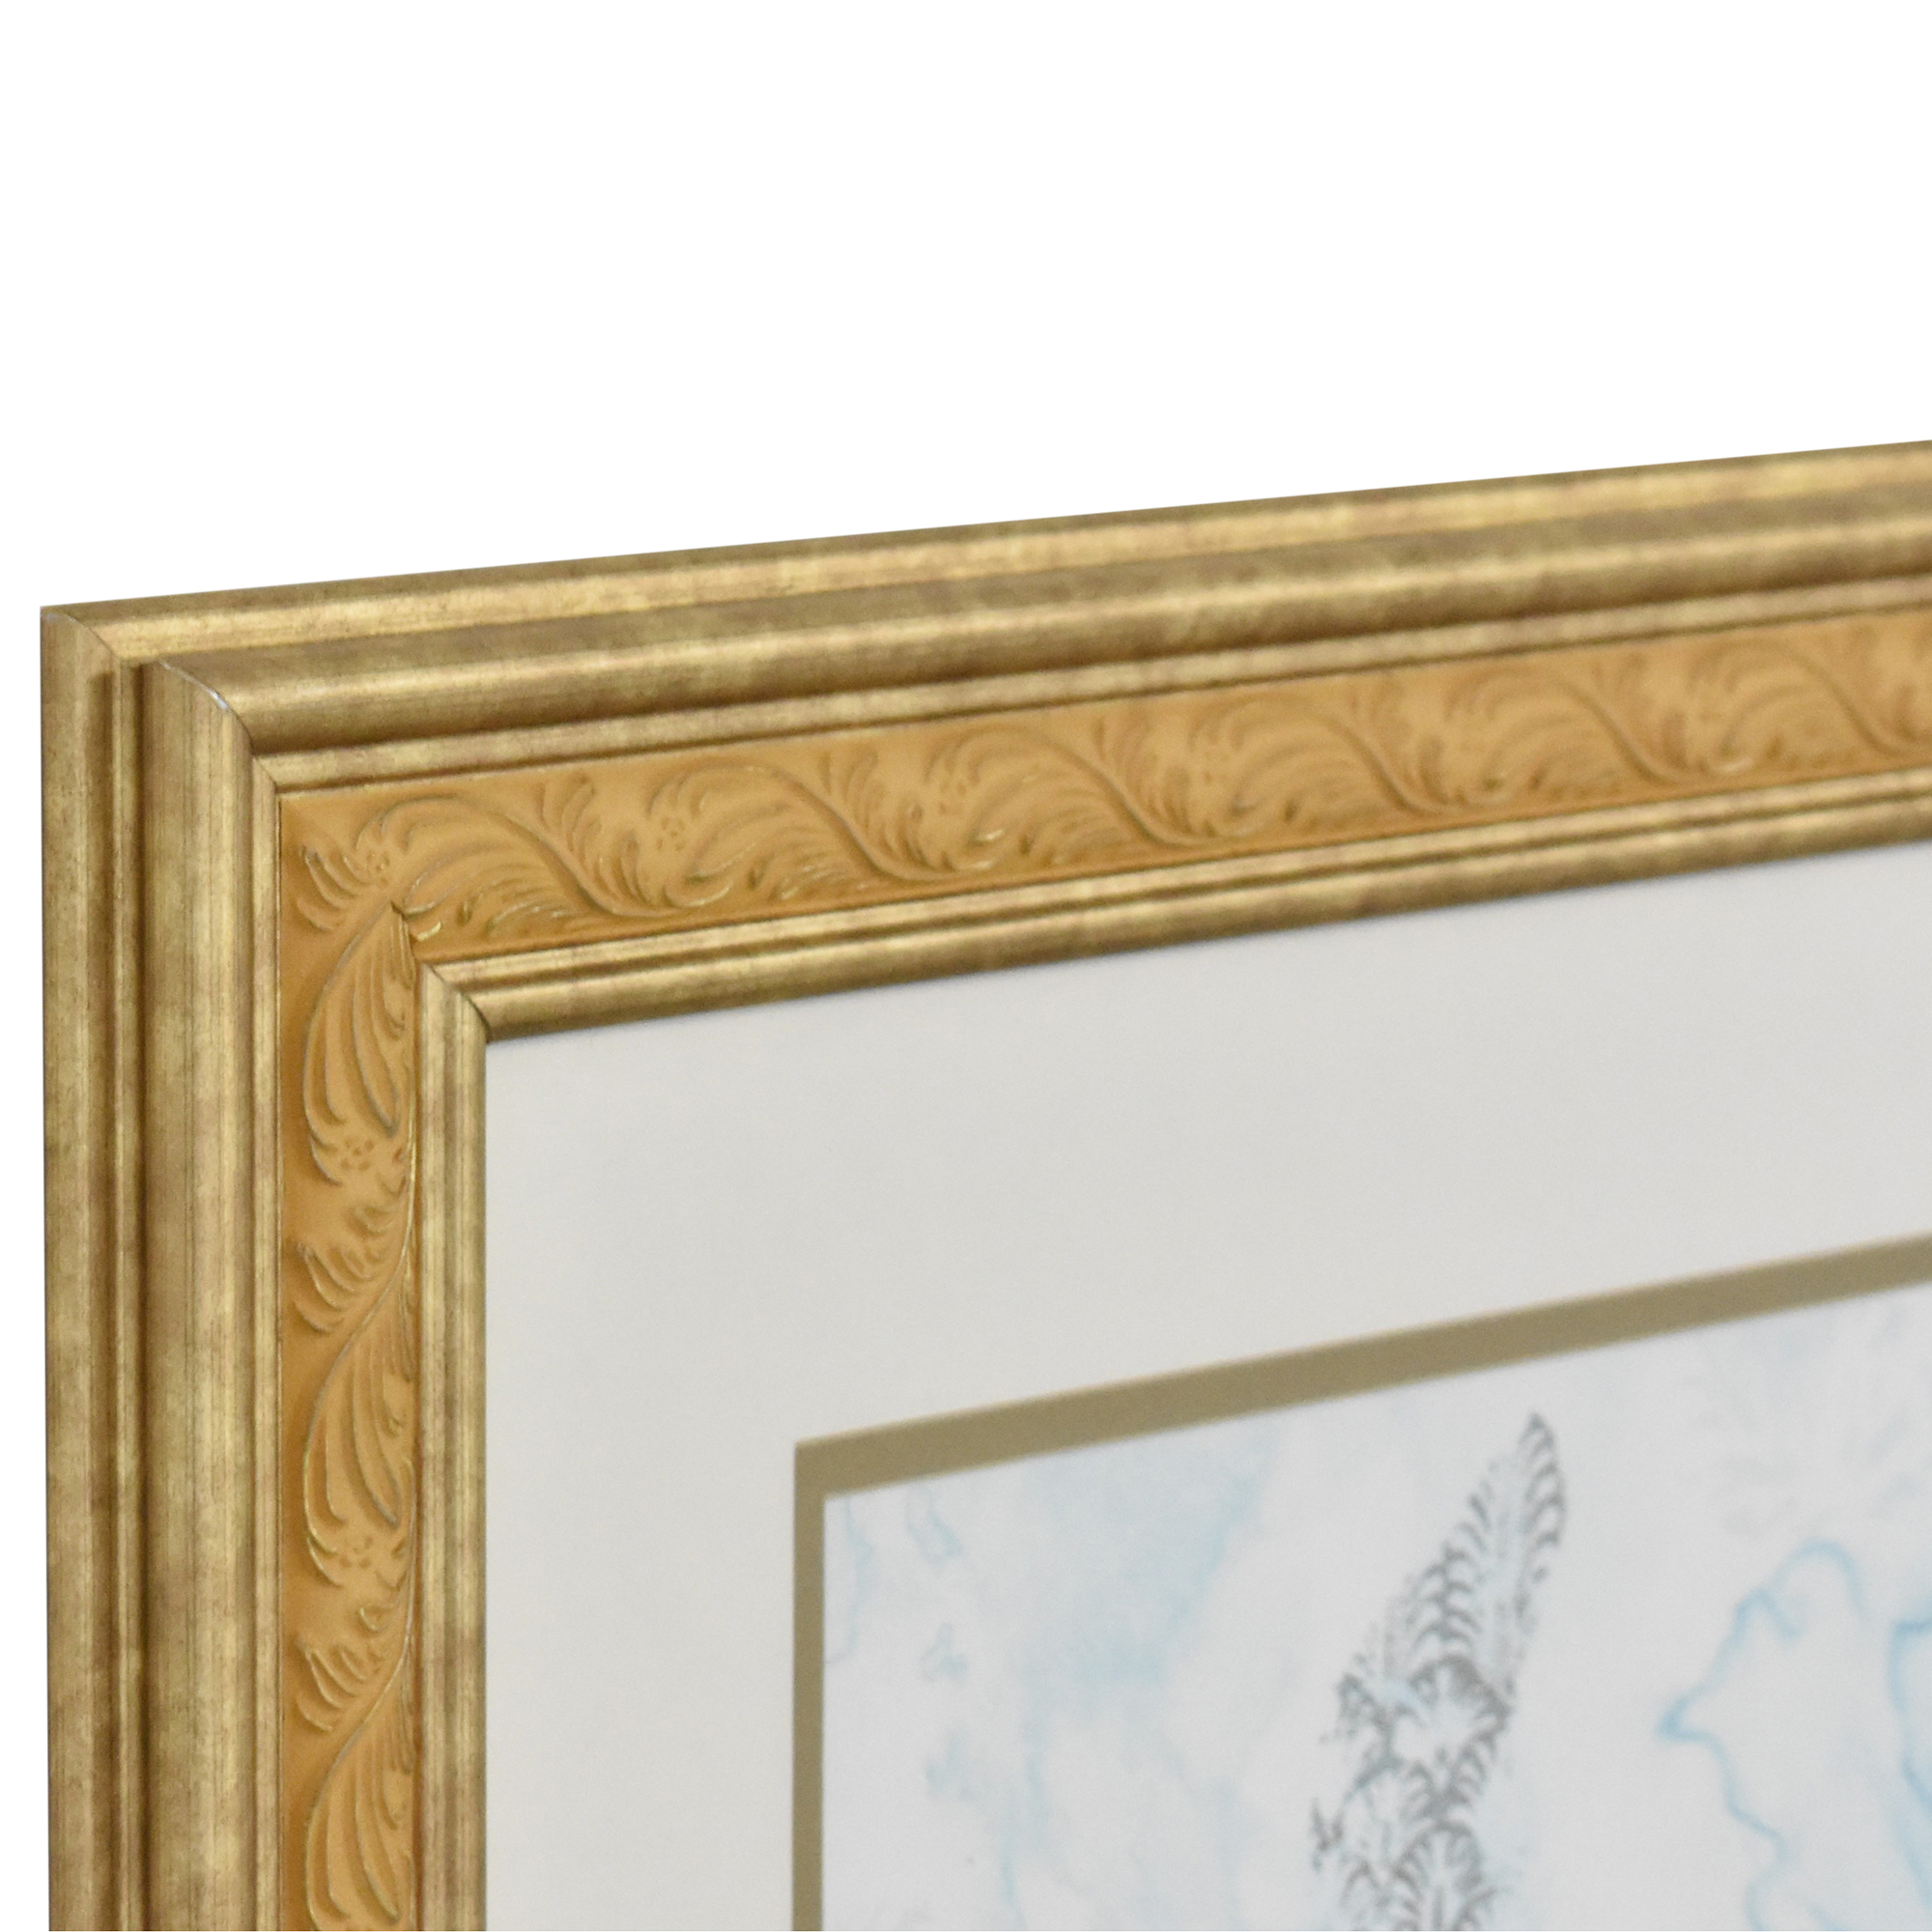 Ethan Allen Ethan Allen Framed Botanical Wall Art for sale